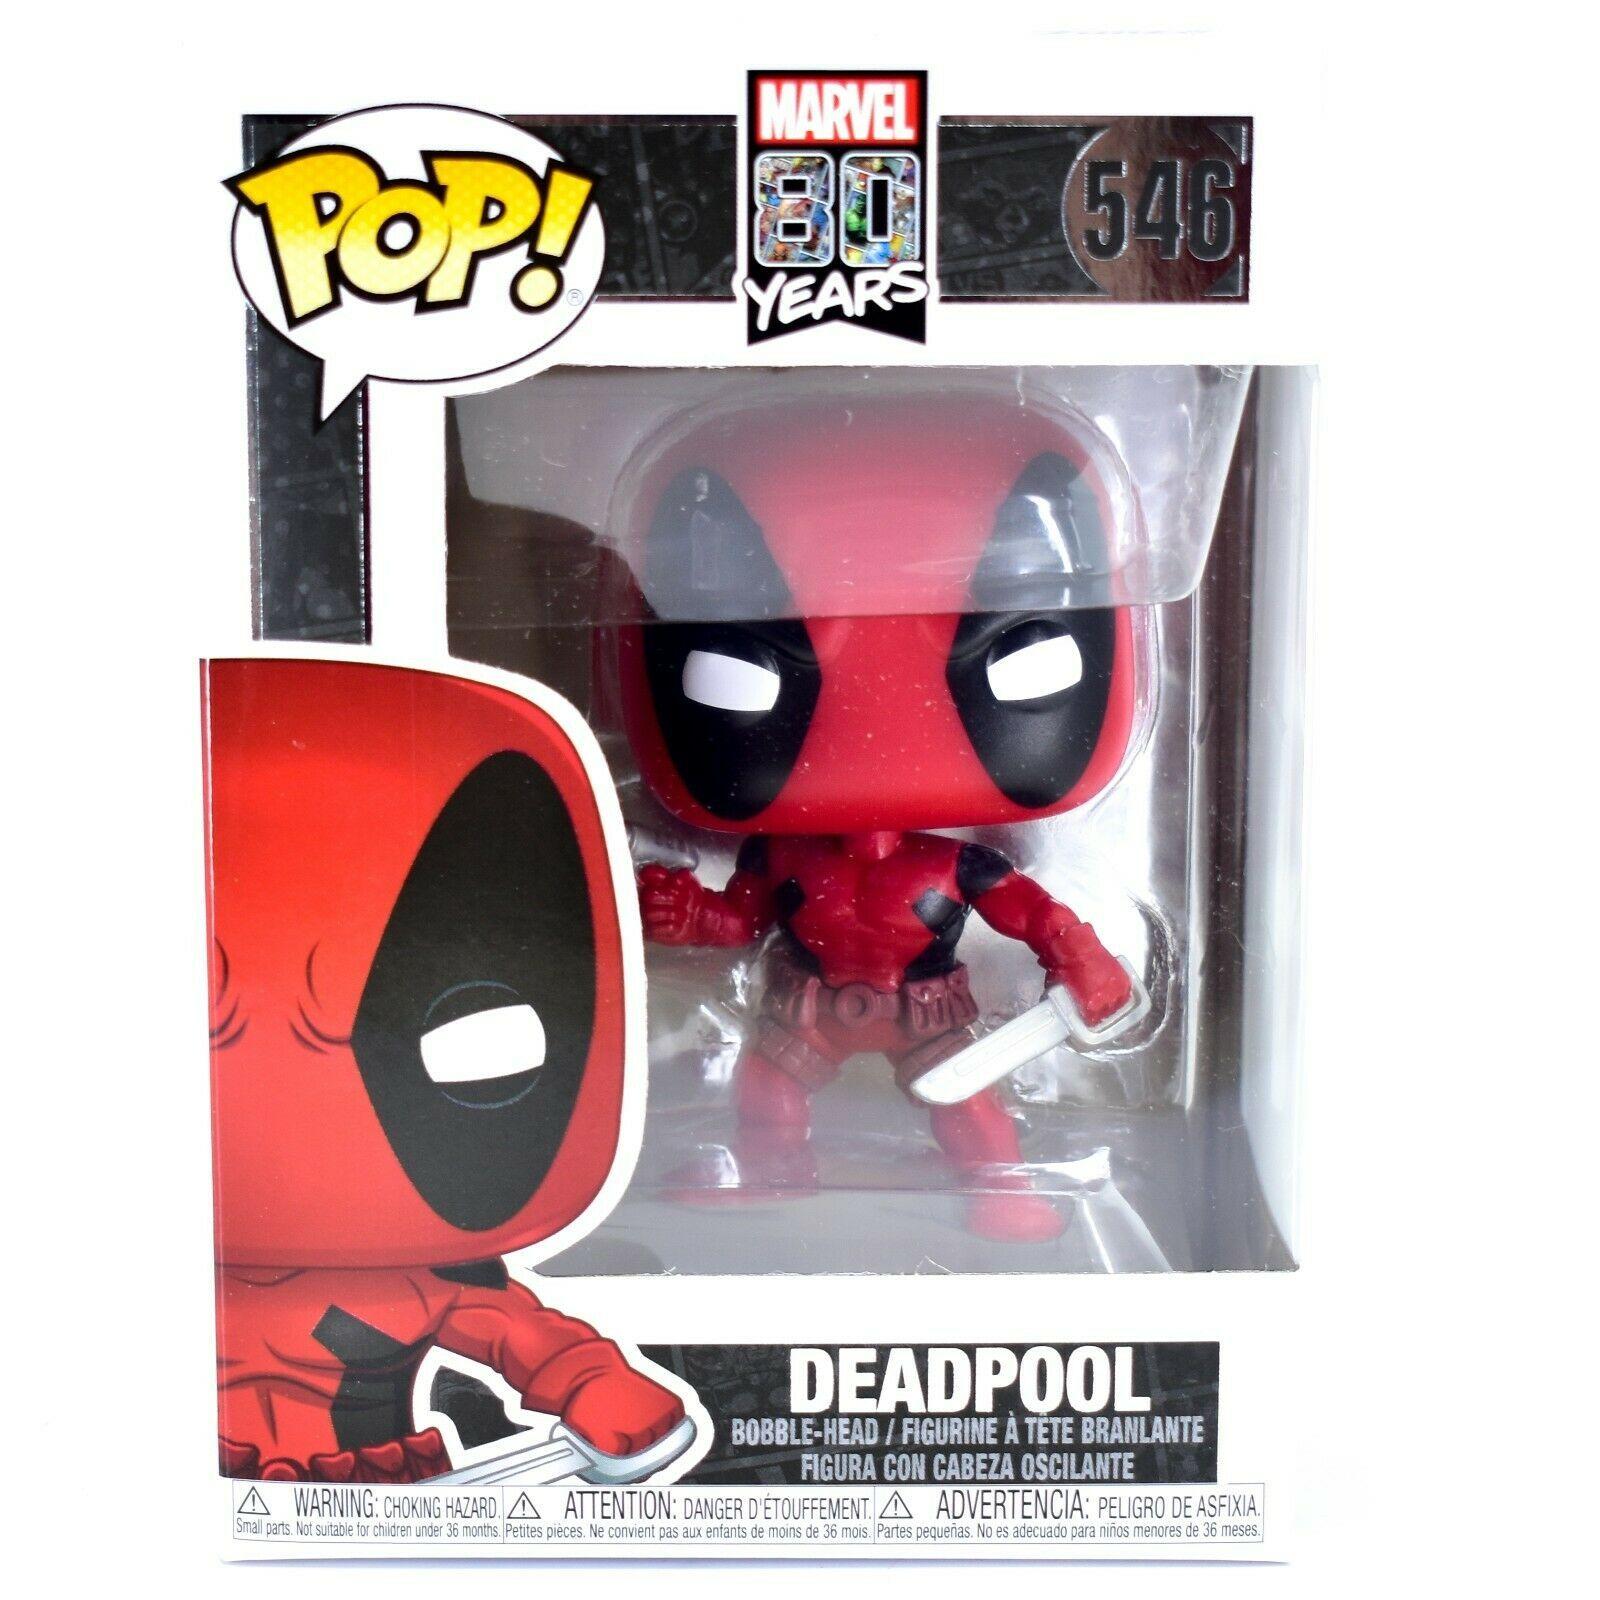 Funko Pop! Marvel 80 Years Deadpool First Appearance #546 Vinyl Bobble-Head